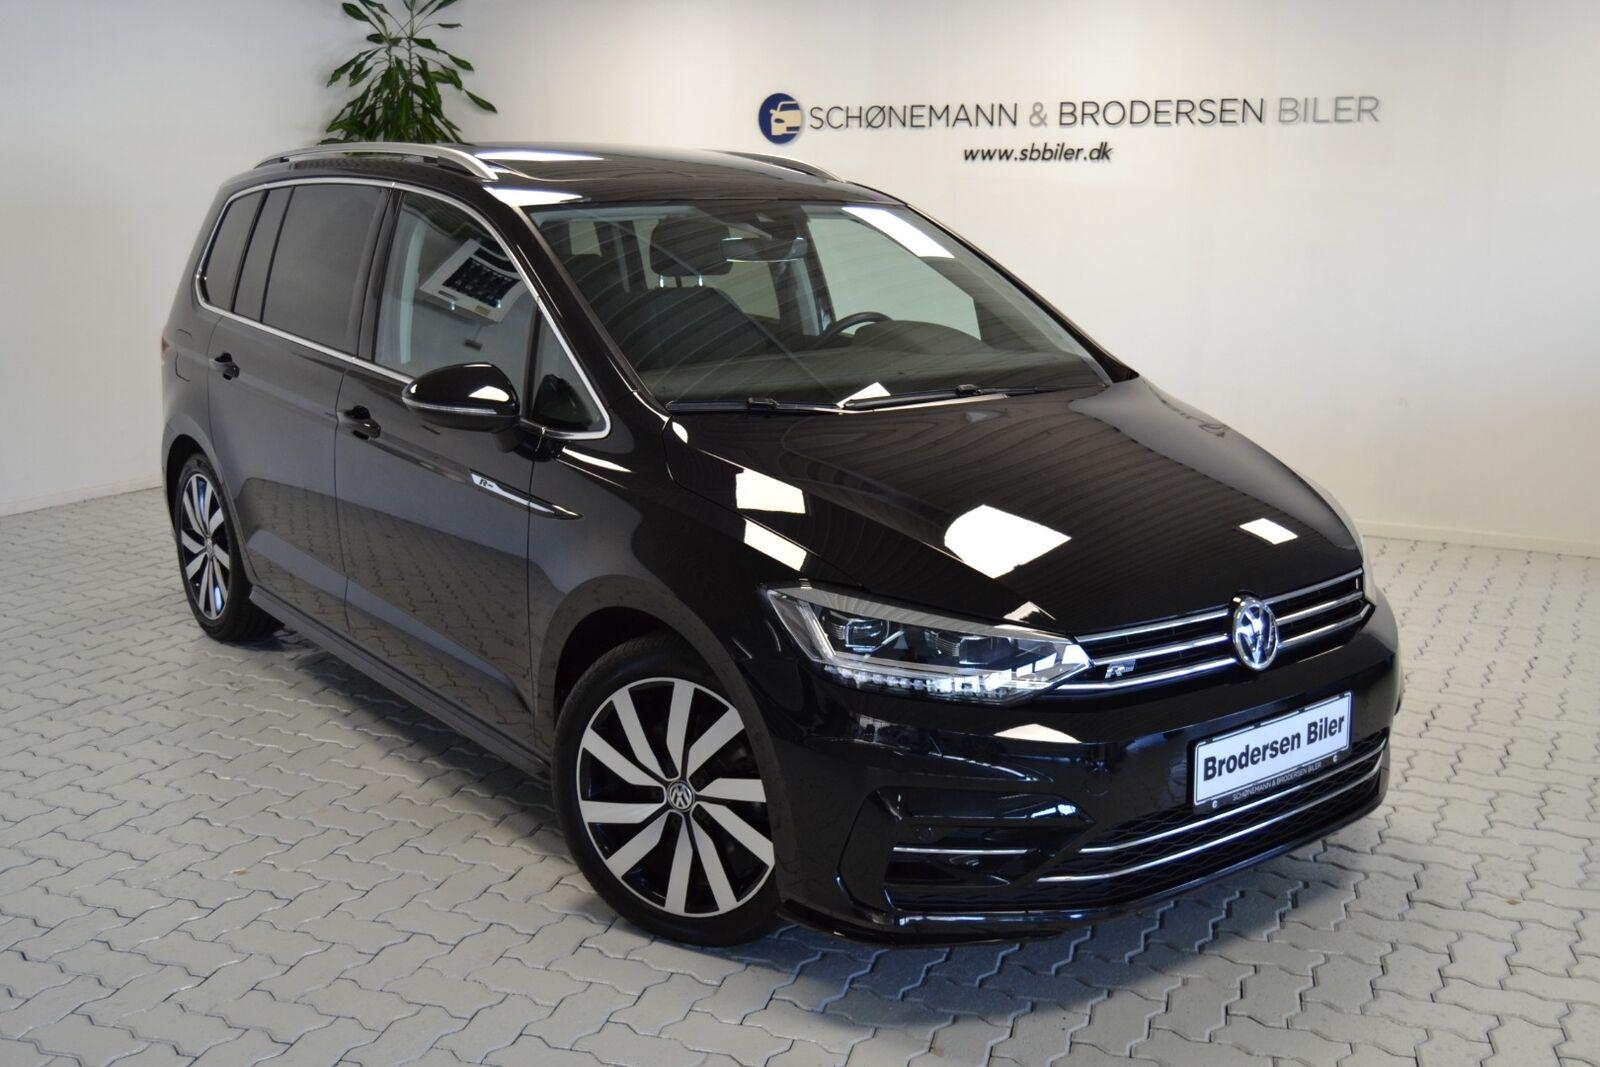 VW Touran 2,0 TDi 190 R-line DSG 7prs 5d - 399.900 kr.